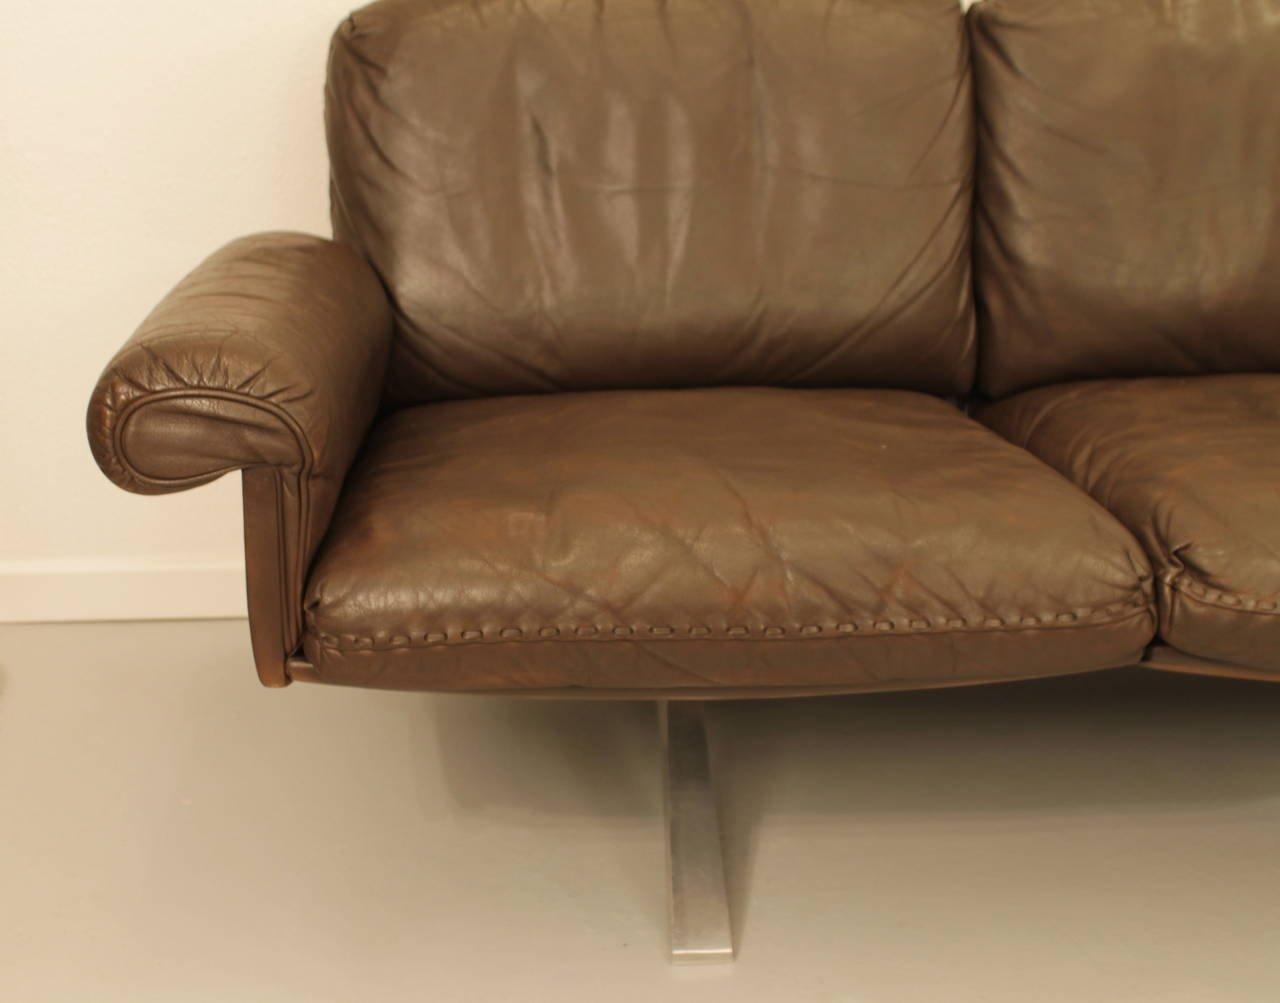 braunes leder sofa von de sede 1973 bei pamono kaufen. Black Bedroom Furniture Sets. Home Design Ideas